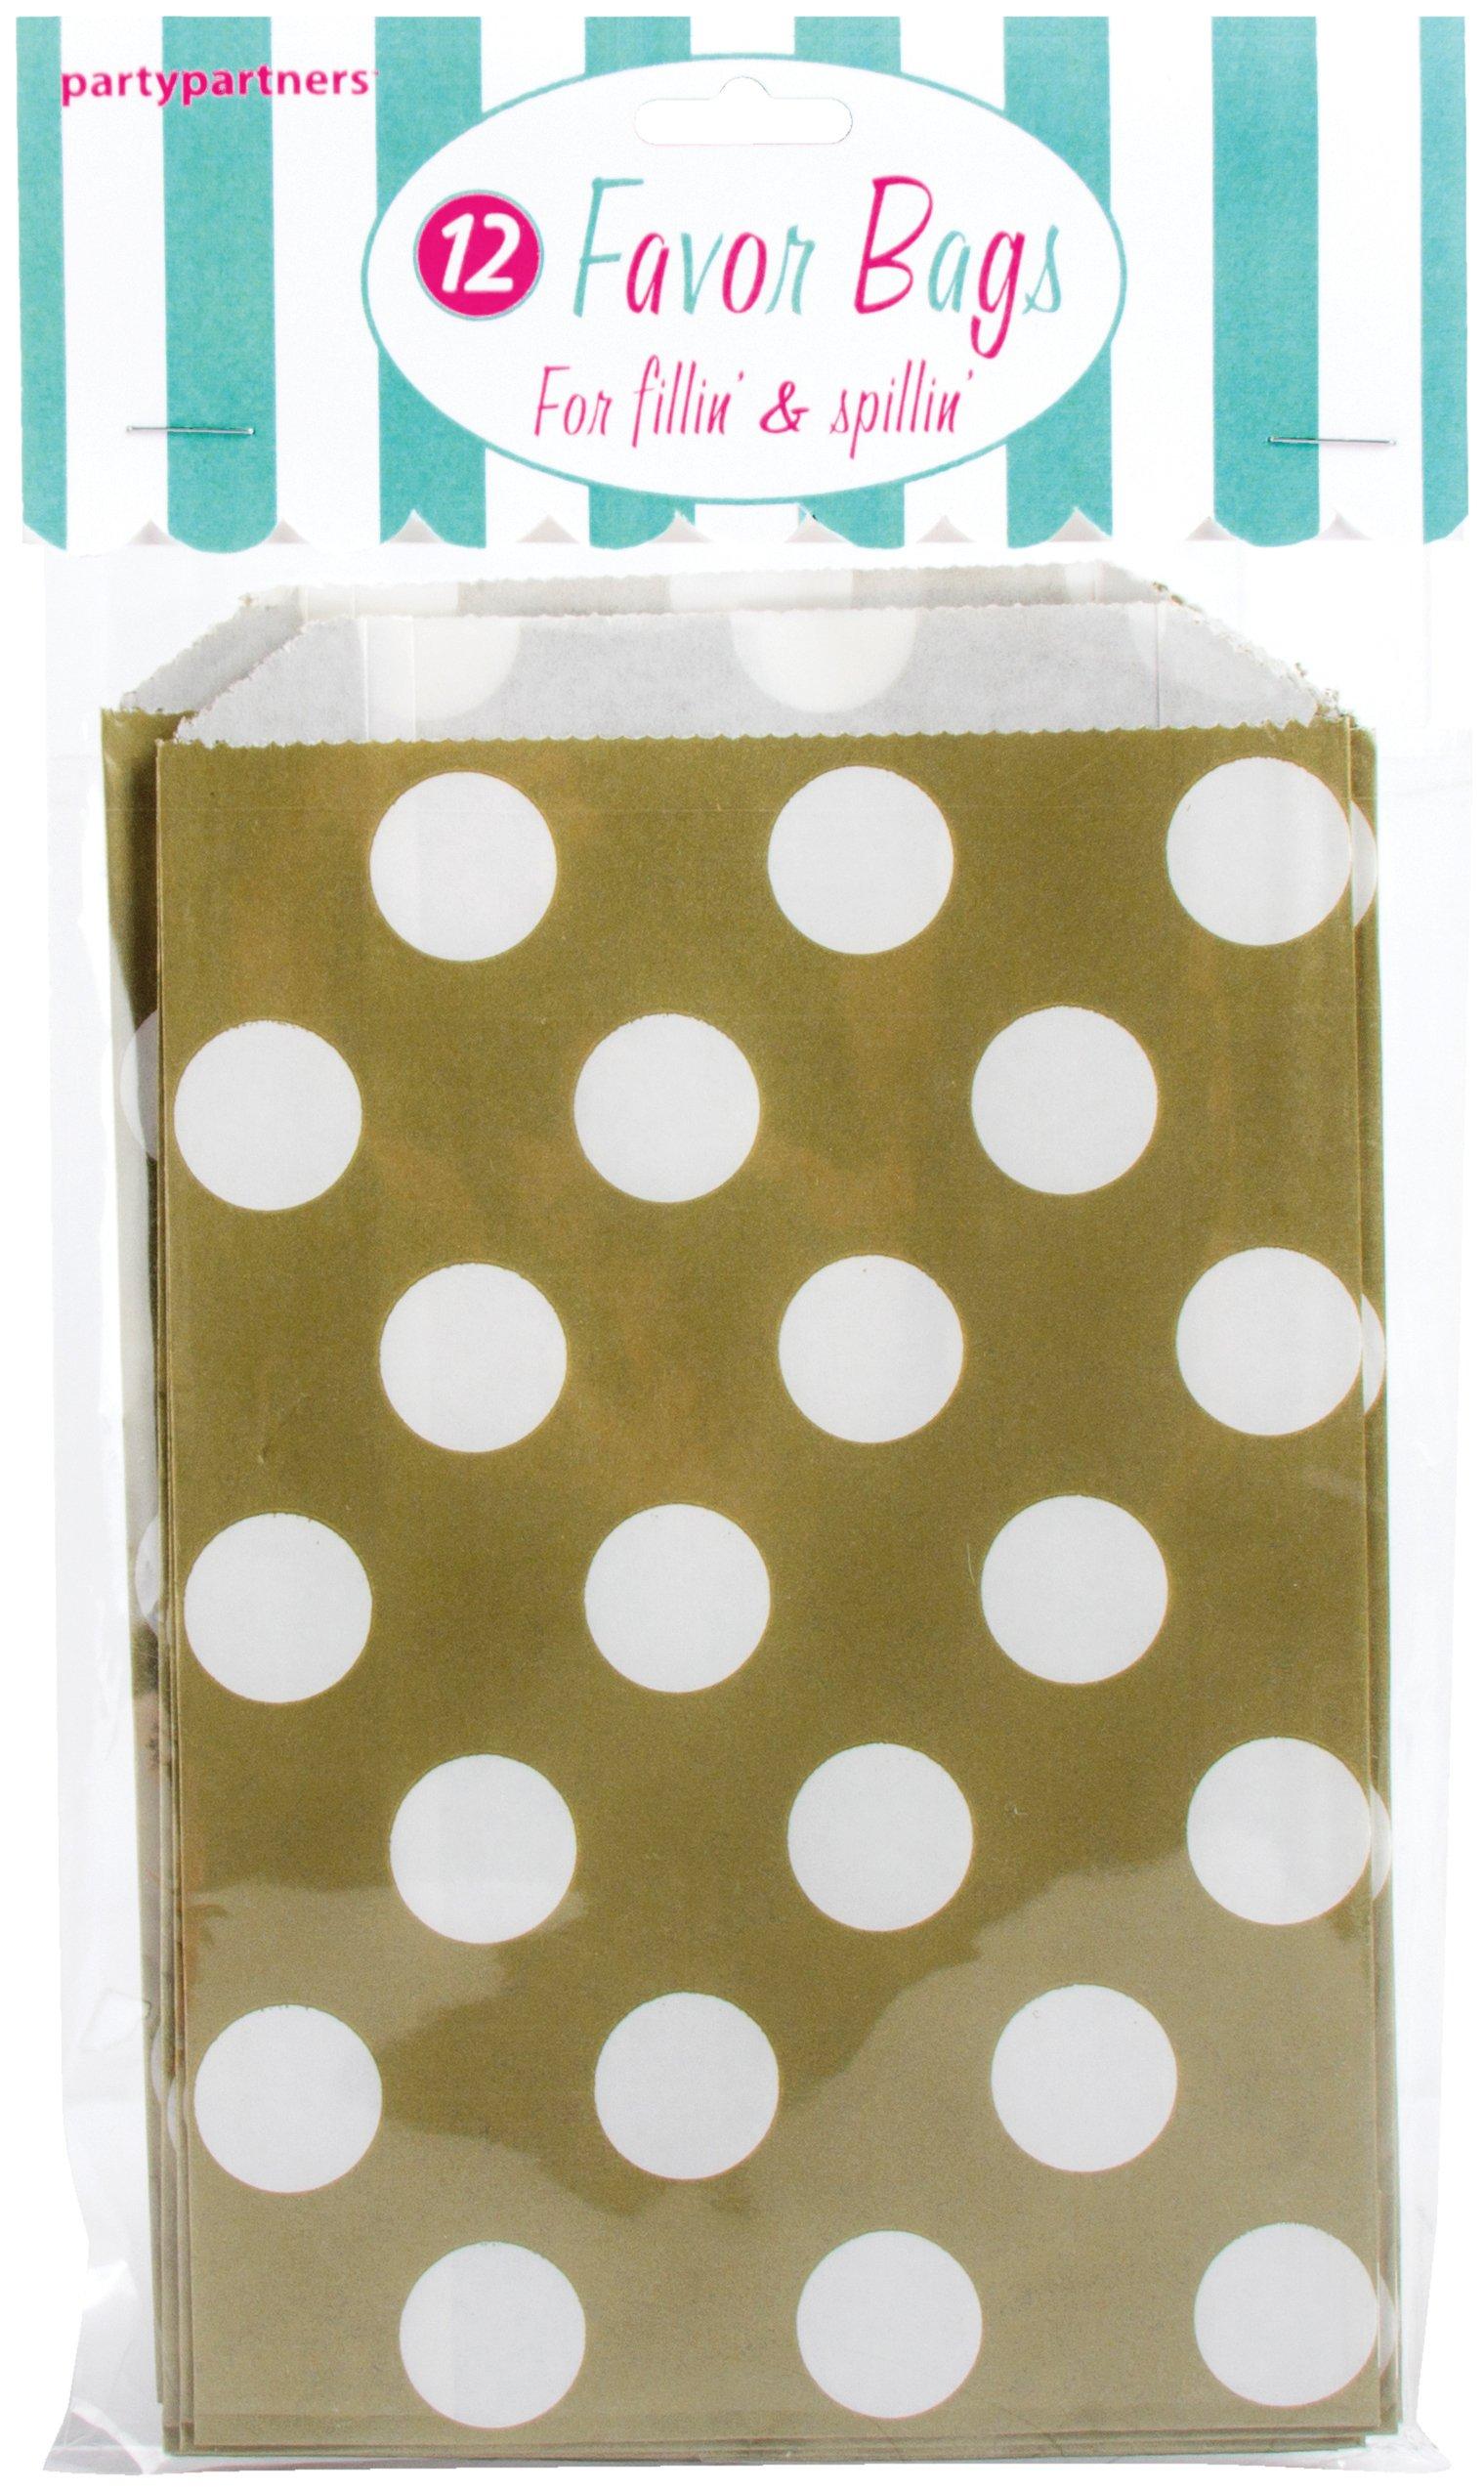 Party Partners 12 Count Paper Favor Bag, Gold Dots